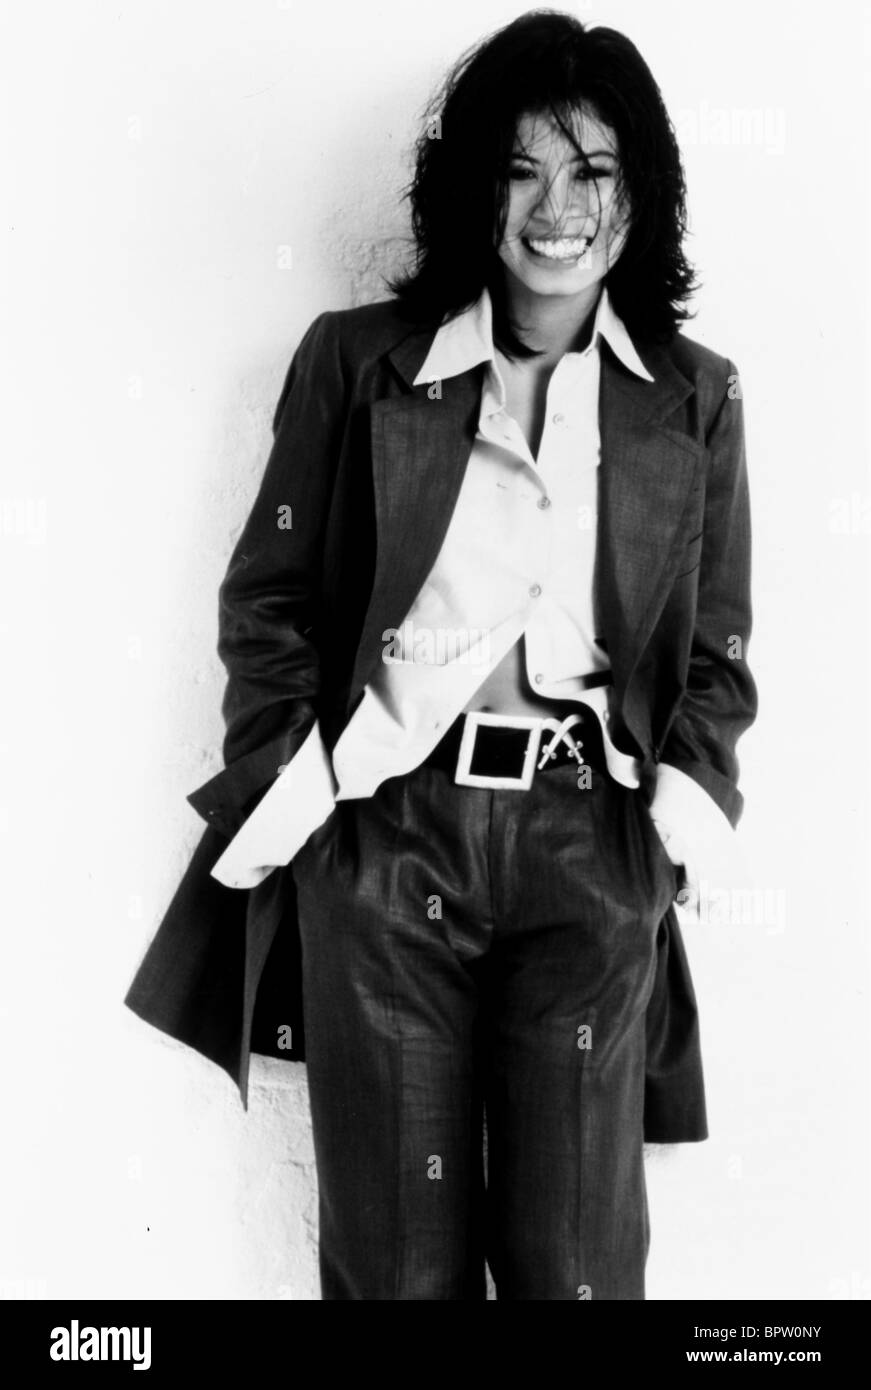 VANESSA MAE MUSICIAN VIOLIN PLAYER (1980) - Stock Image